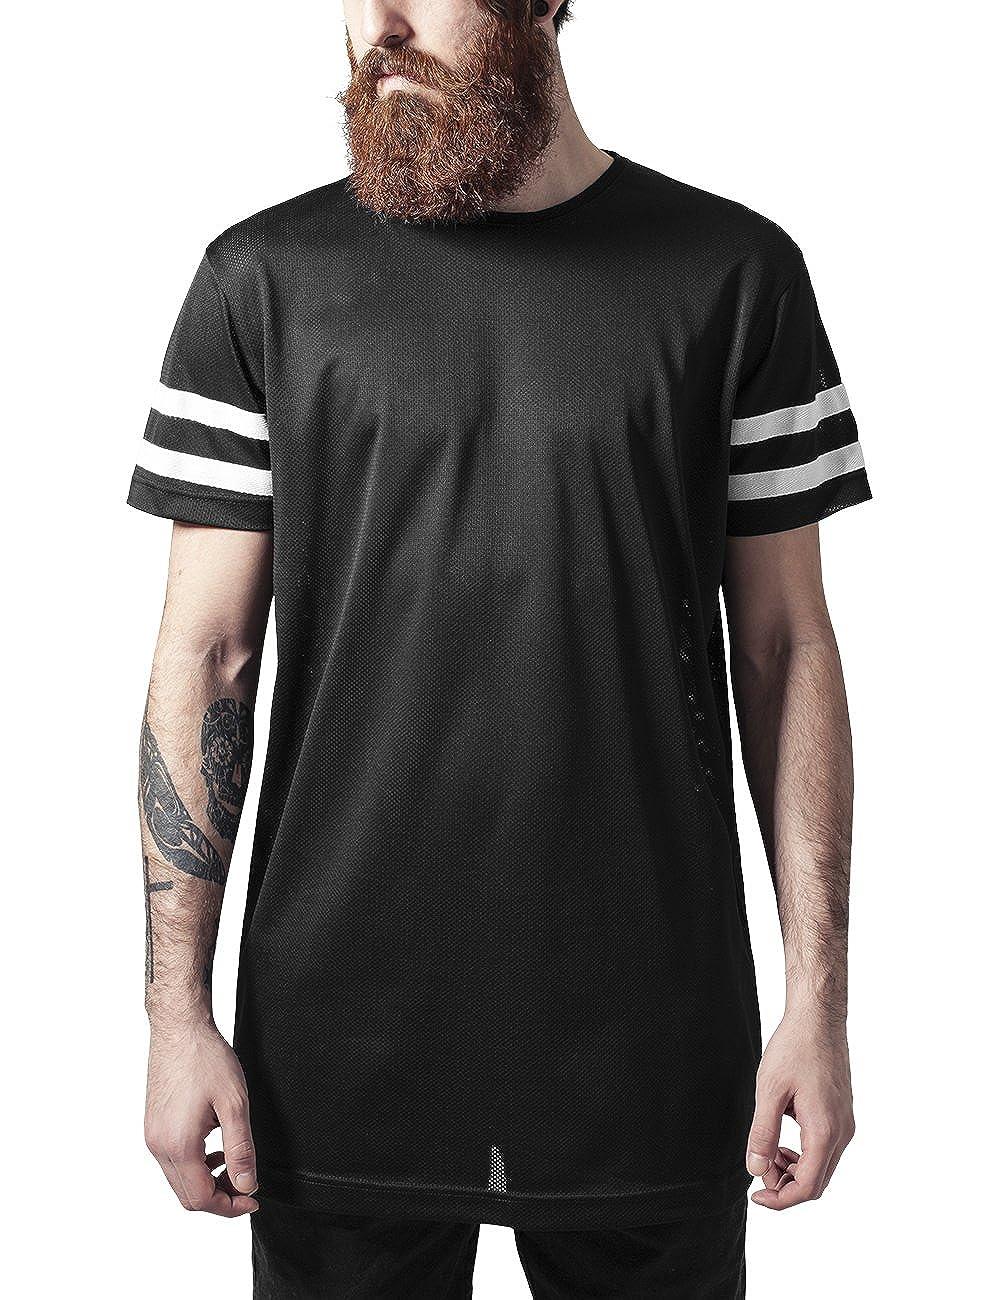 Urban Classics Stripe Mesh Tee, T-Shirt Uomo TB1236